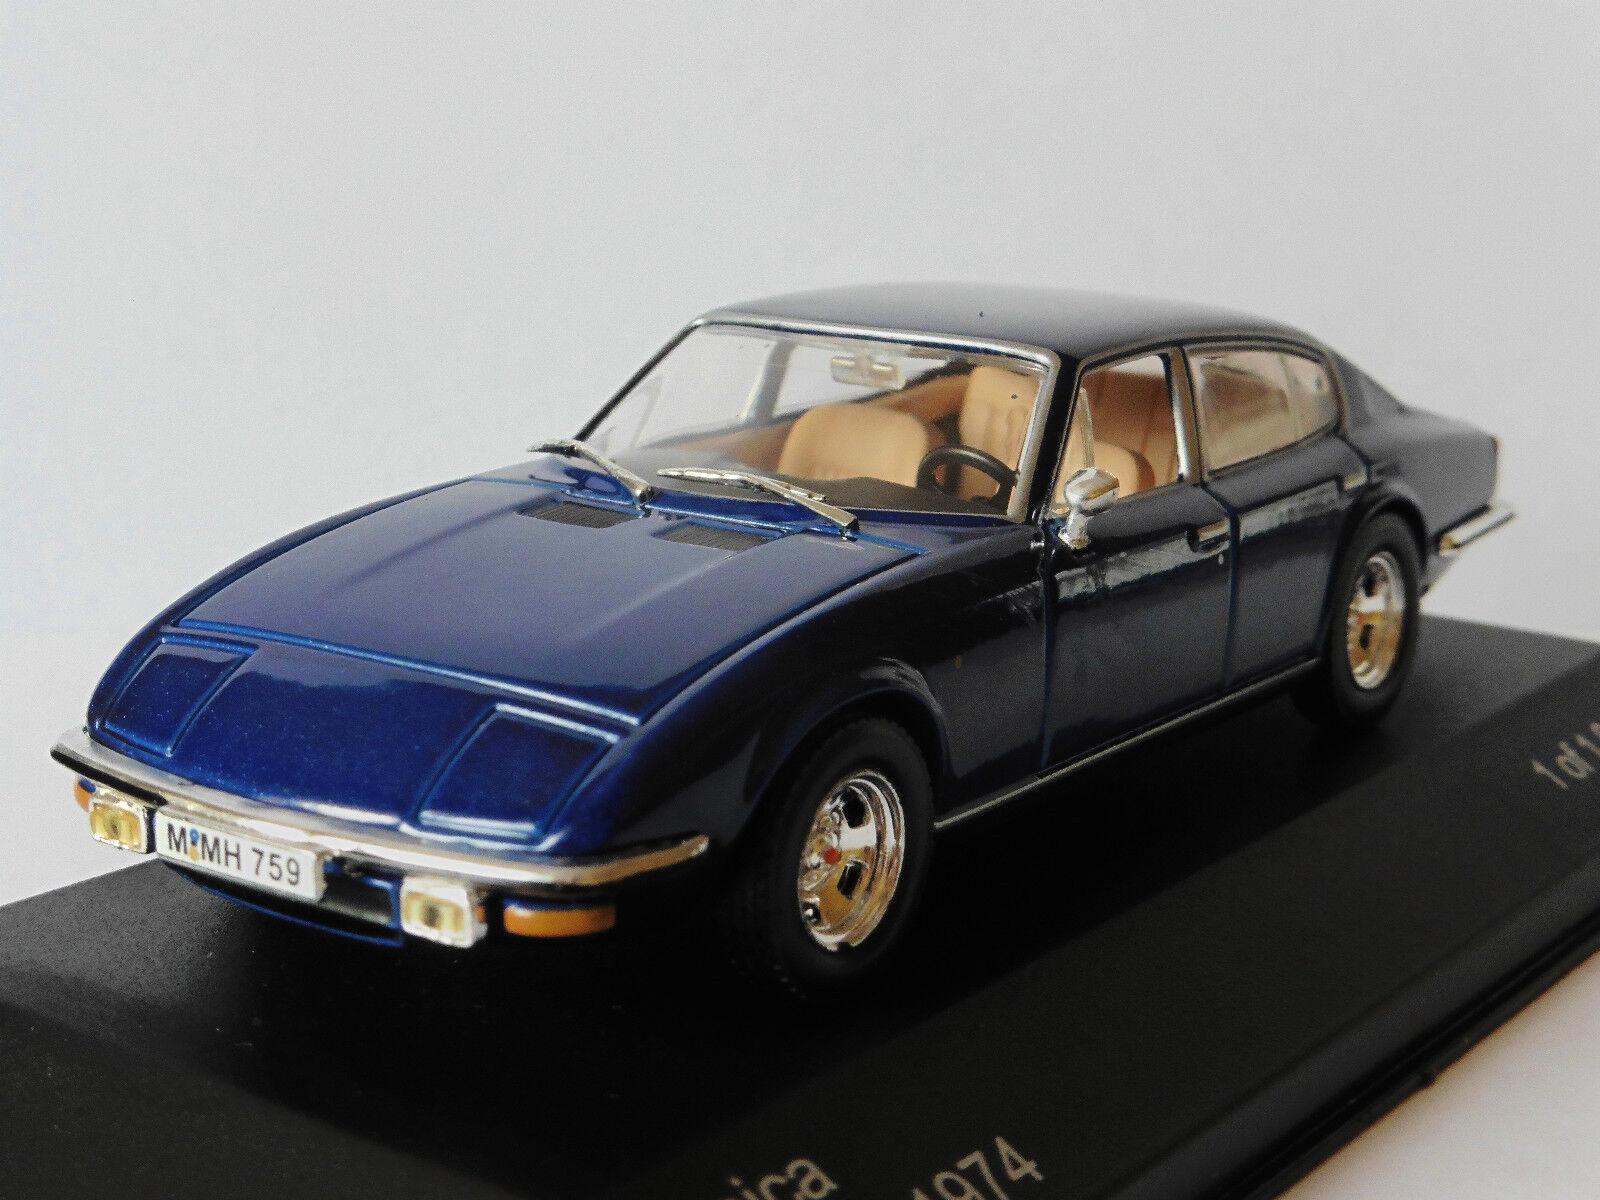 MONICA 560 V8 1974 DARK blueE WHITEBOX WB085 1 43 LIMITED EDITION 1000 PIECES